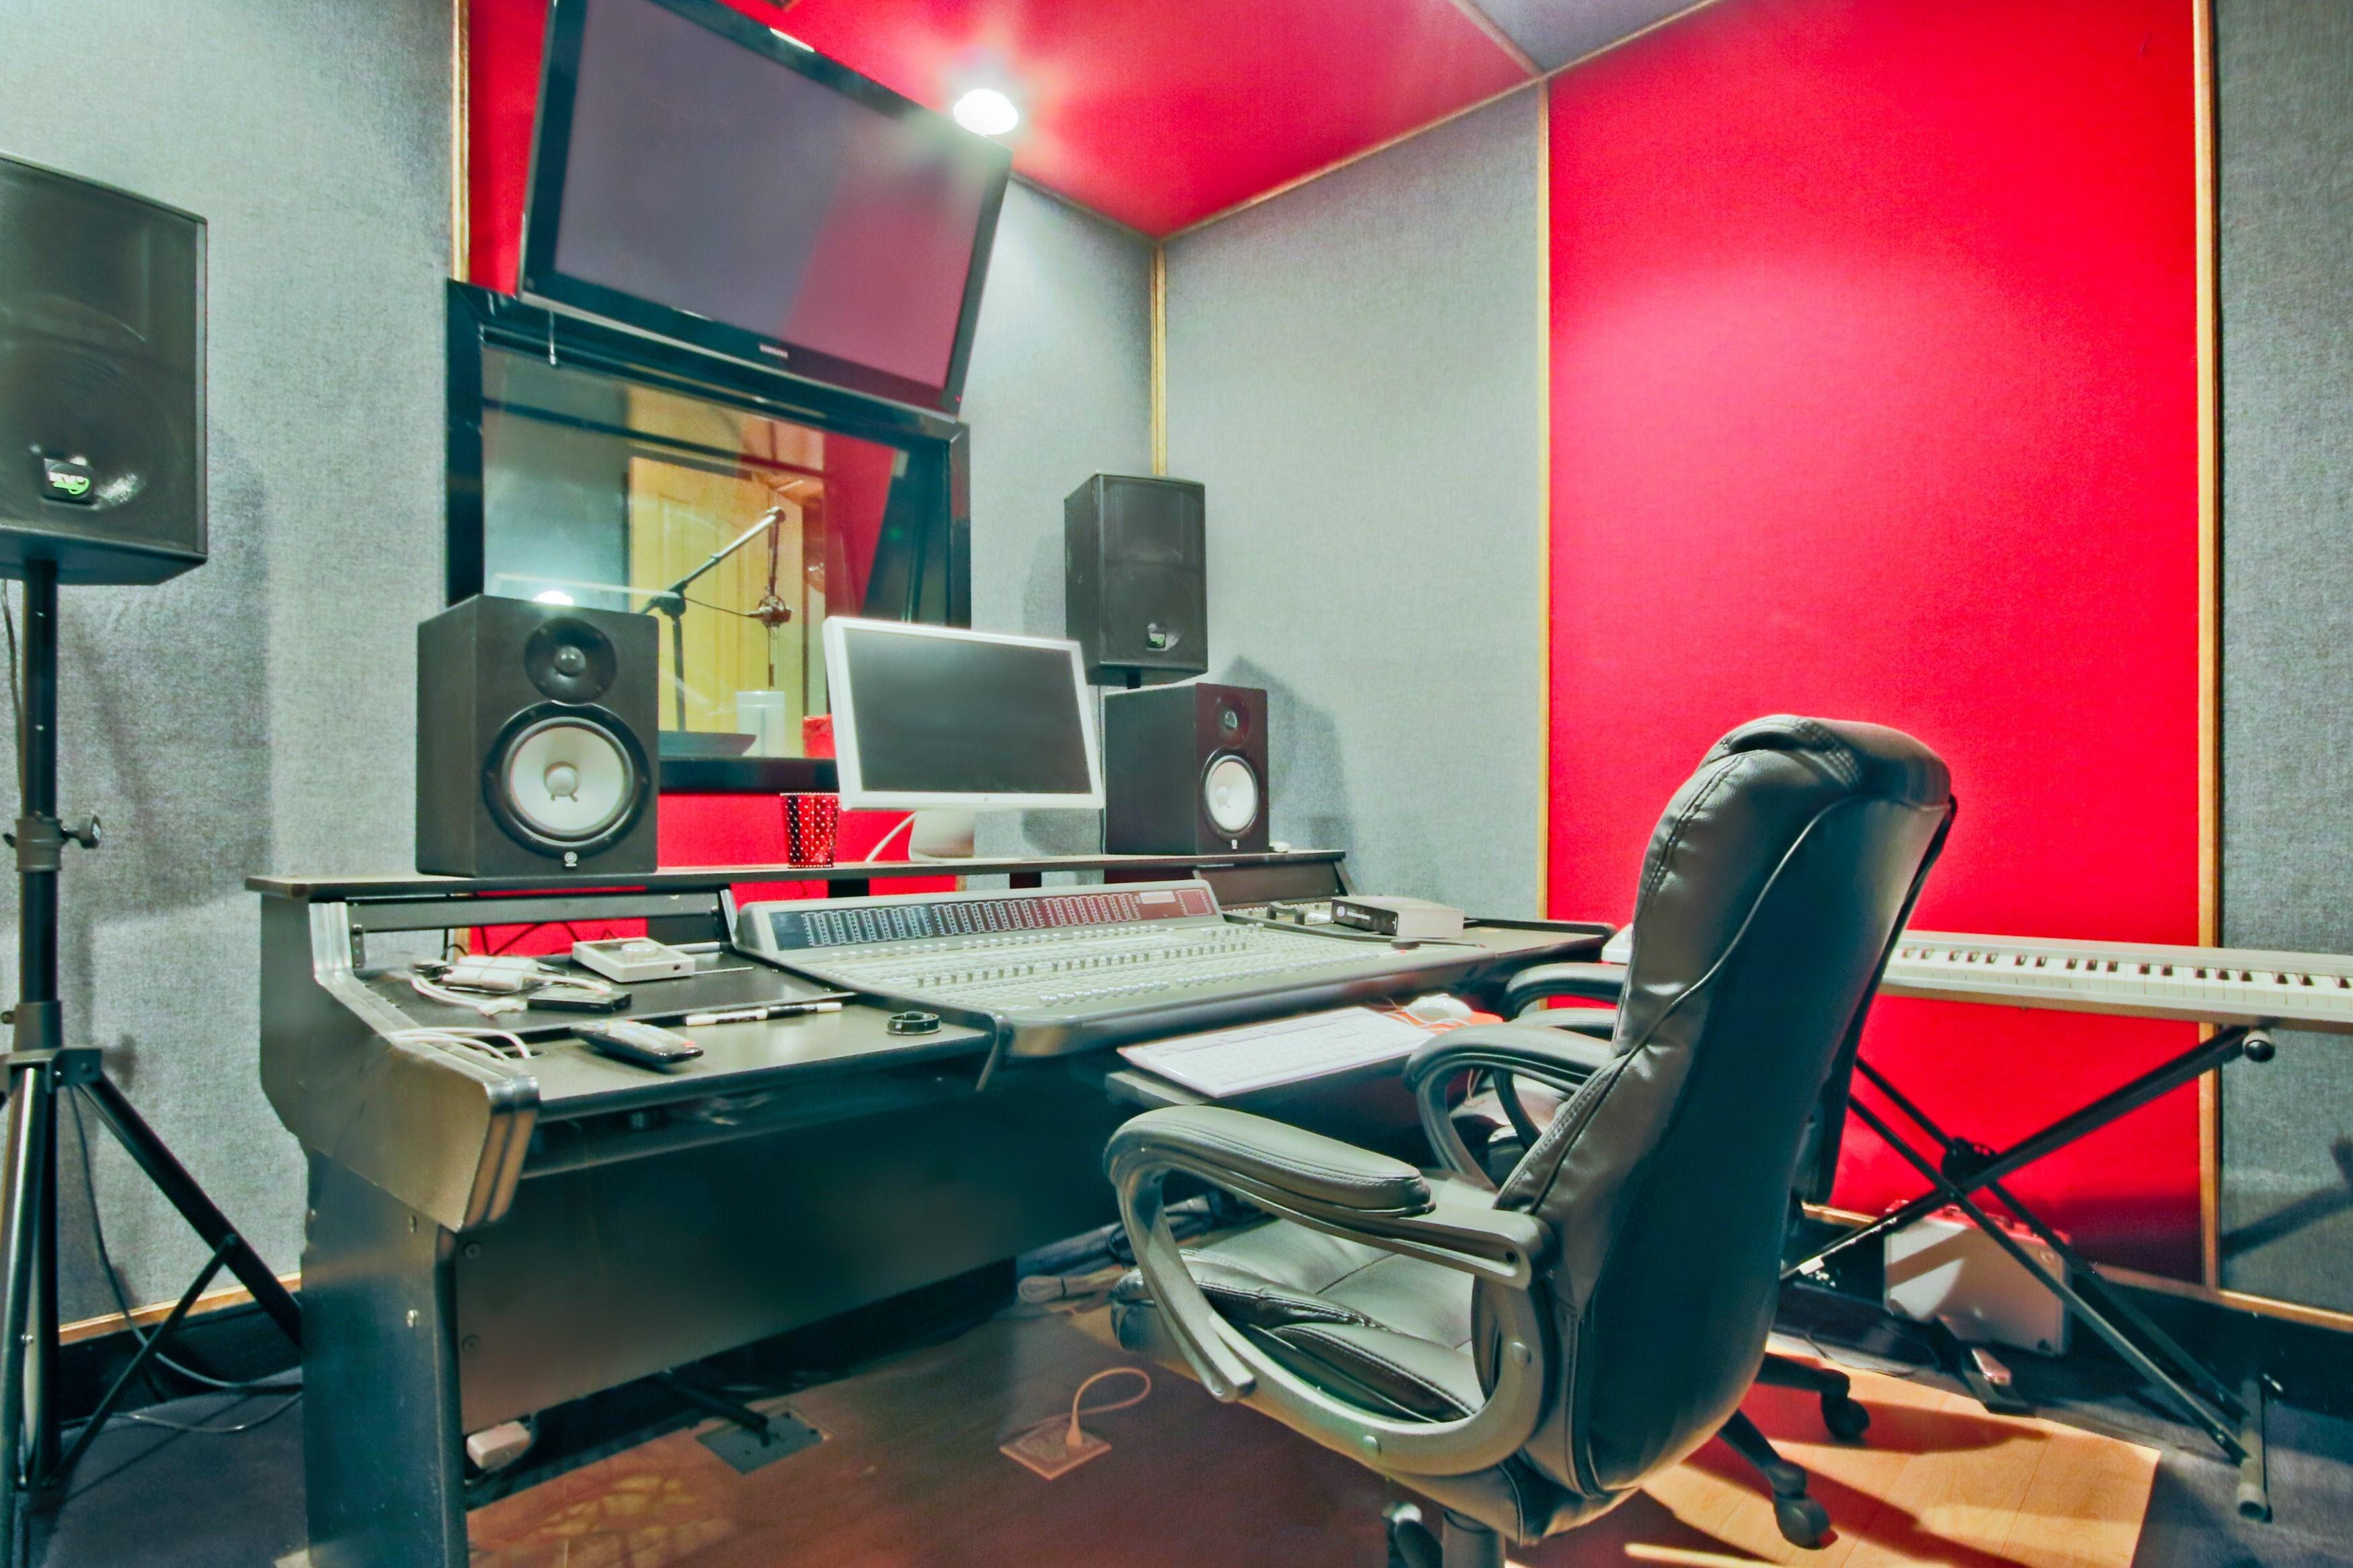 066_Recording Studio